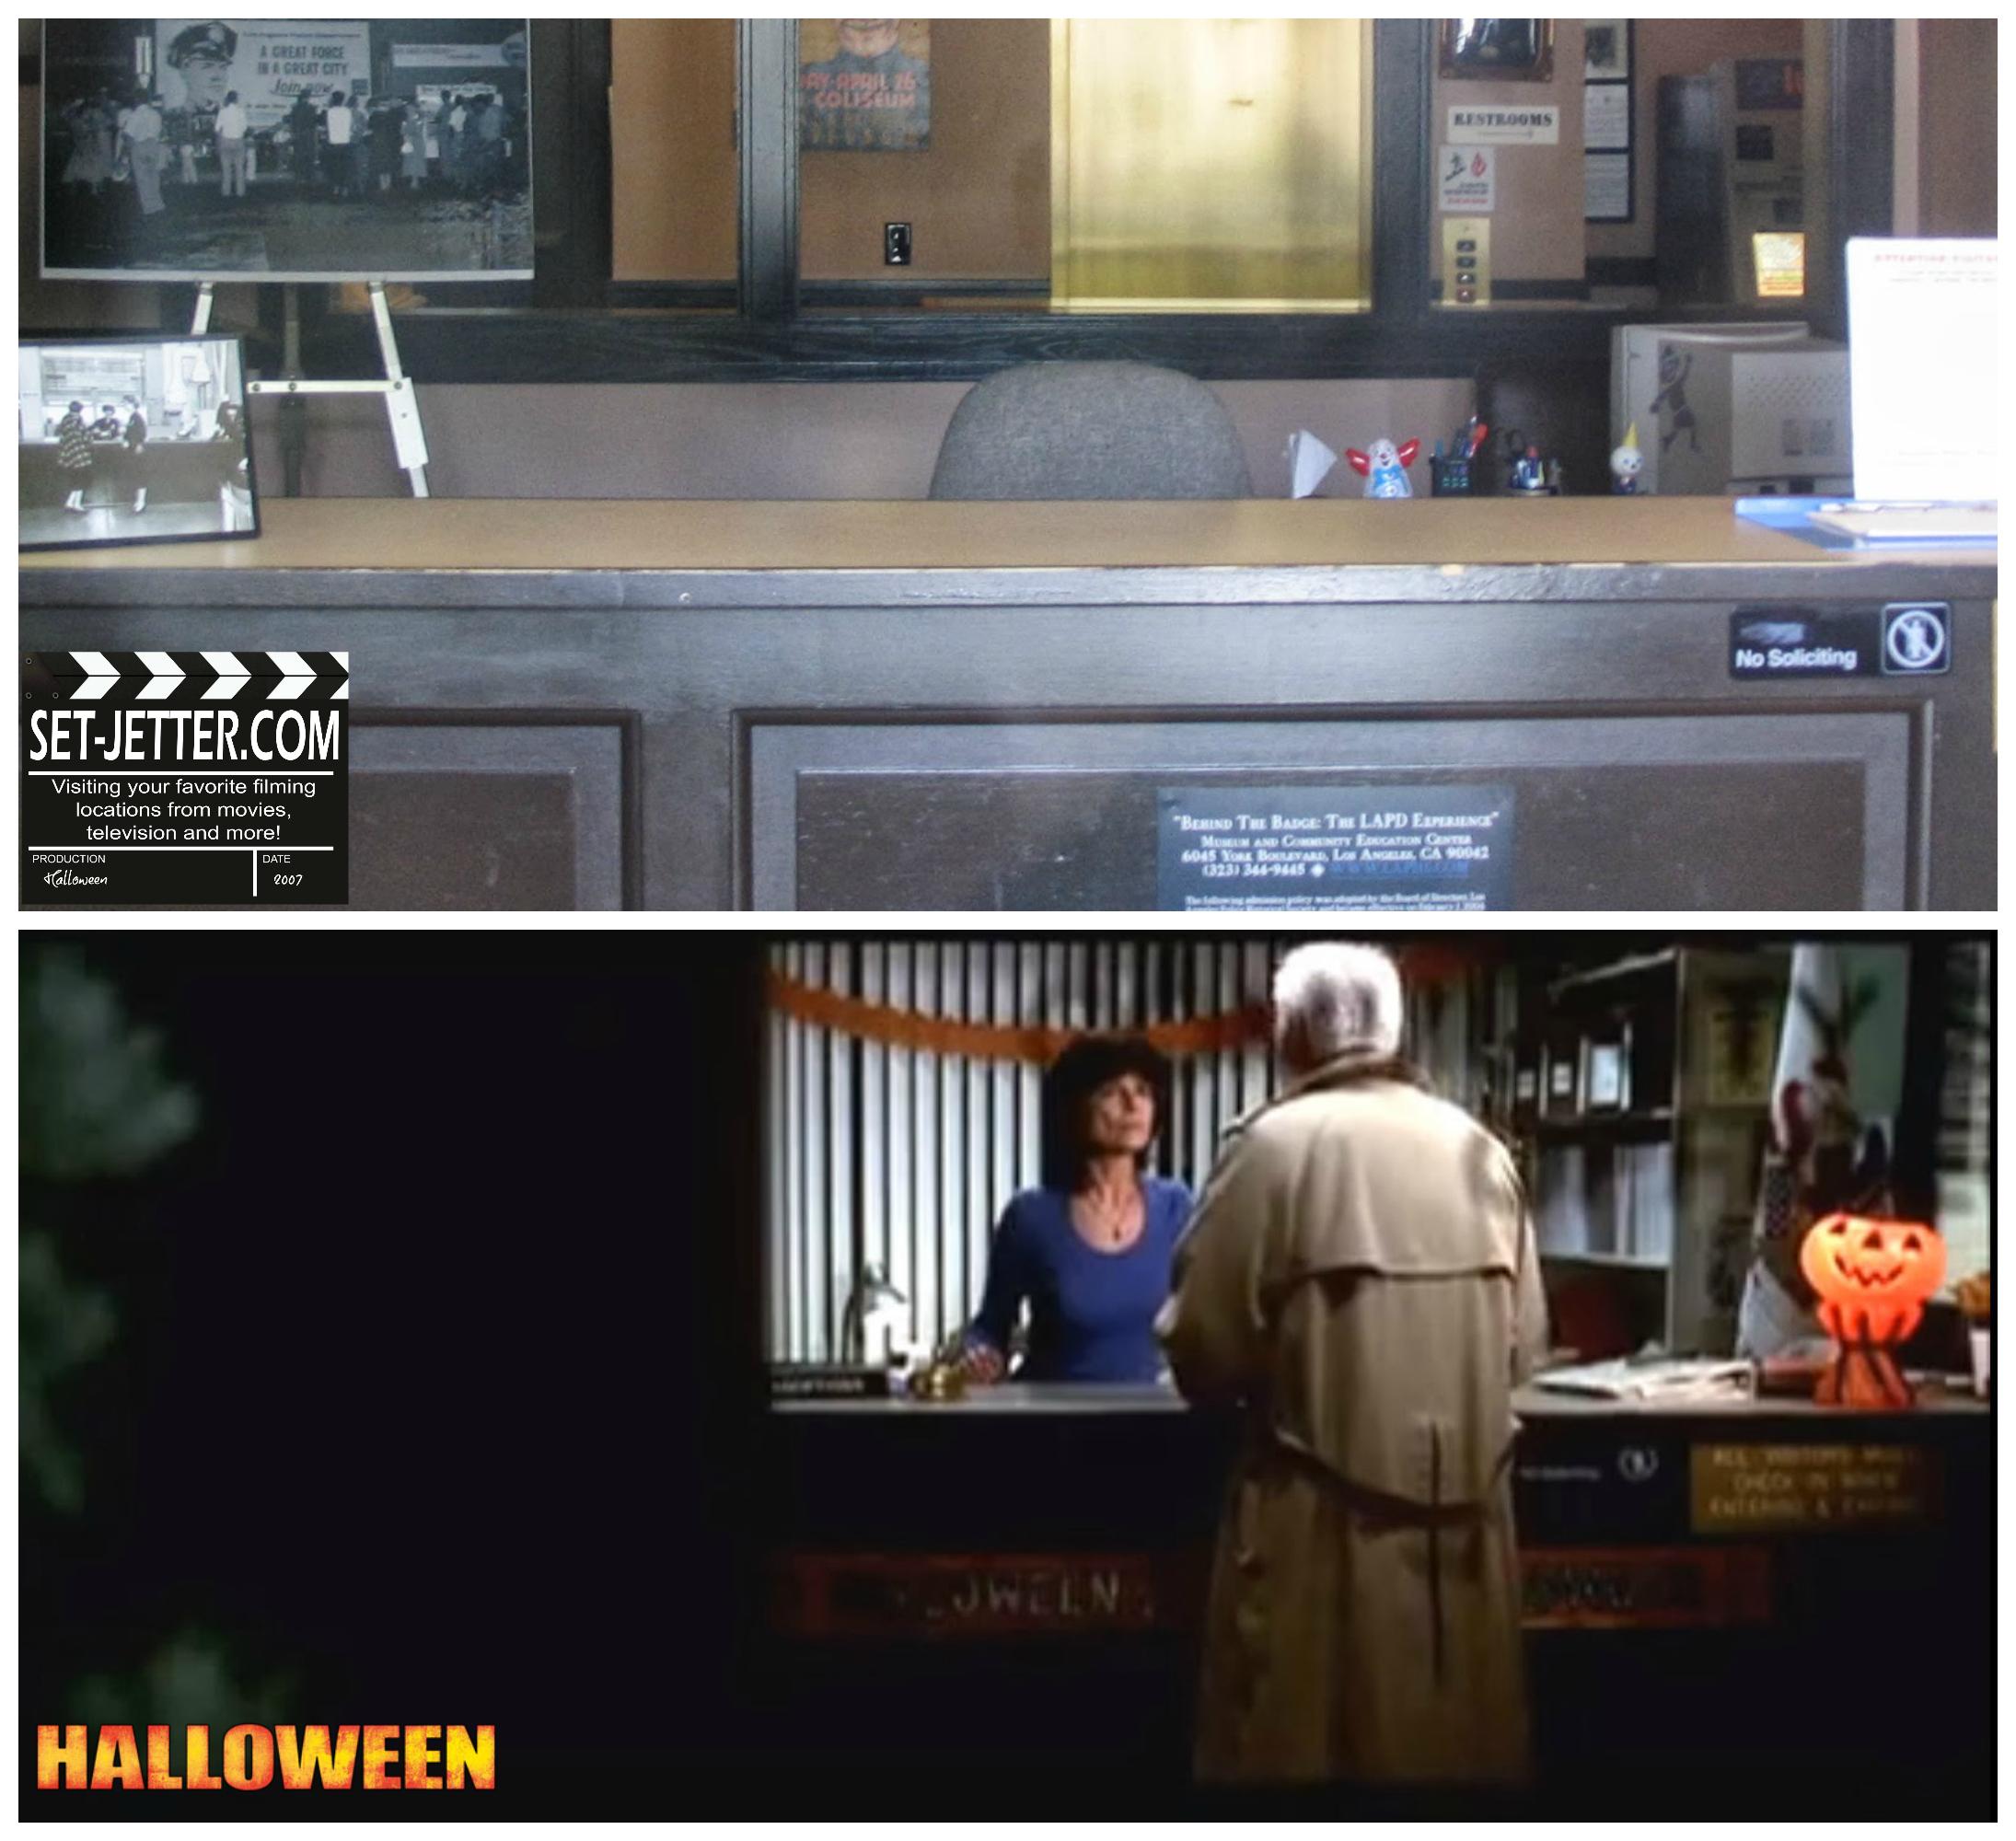 Halloween 2007 comparison 49.jpg